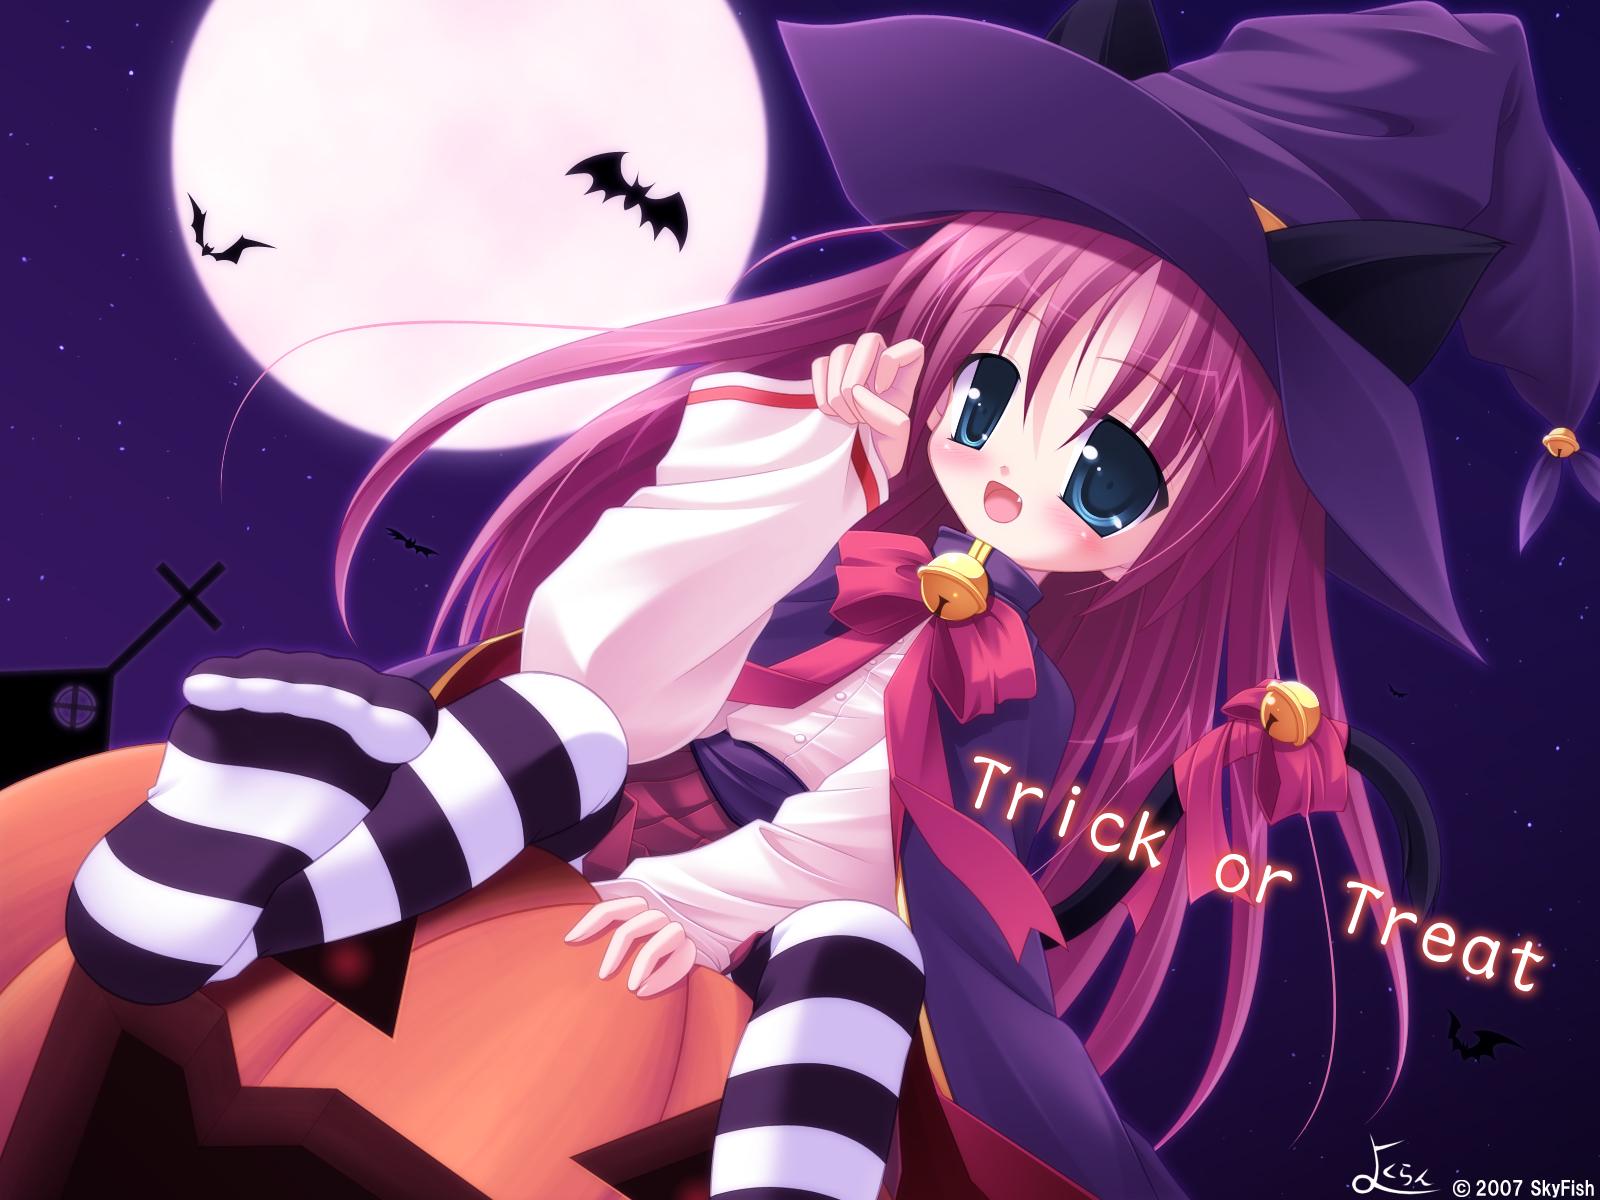 animal animal_ears bat bell bow catgirl choker fang halloween hat loli long_hair moon night pumpkin purple_hair ribbons sky skyfish thighhighs tsubasa_tamago witch